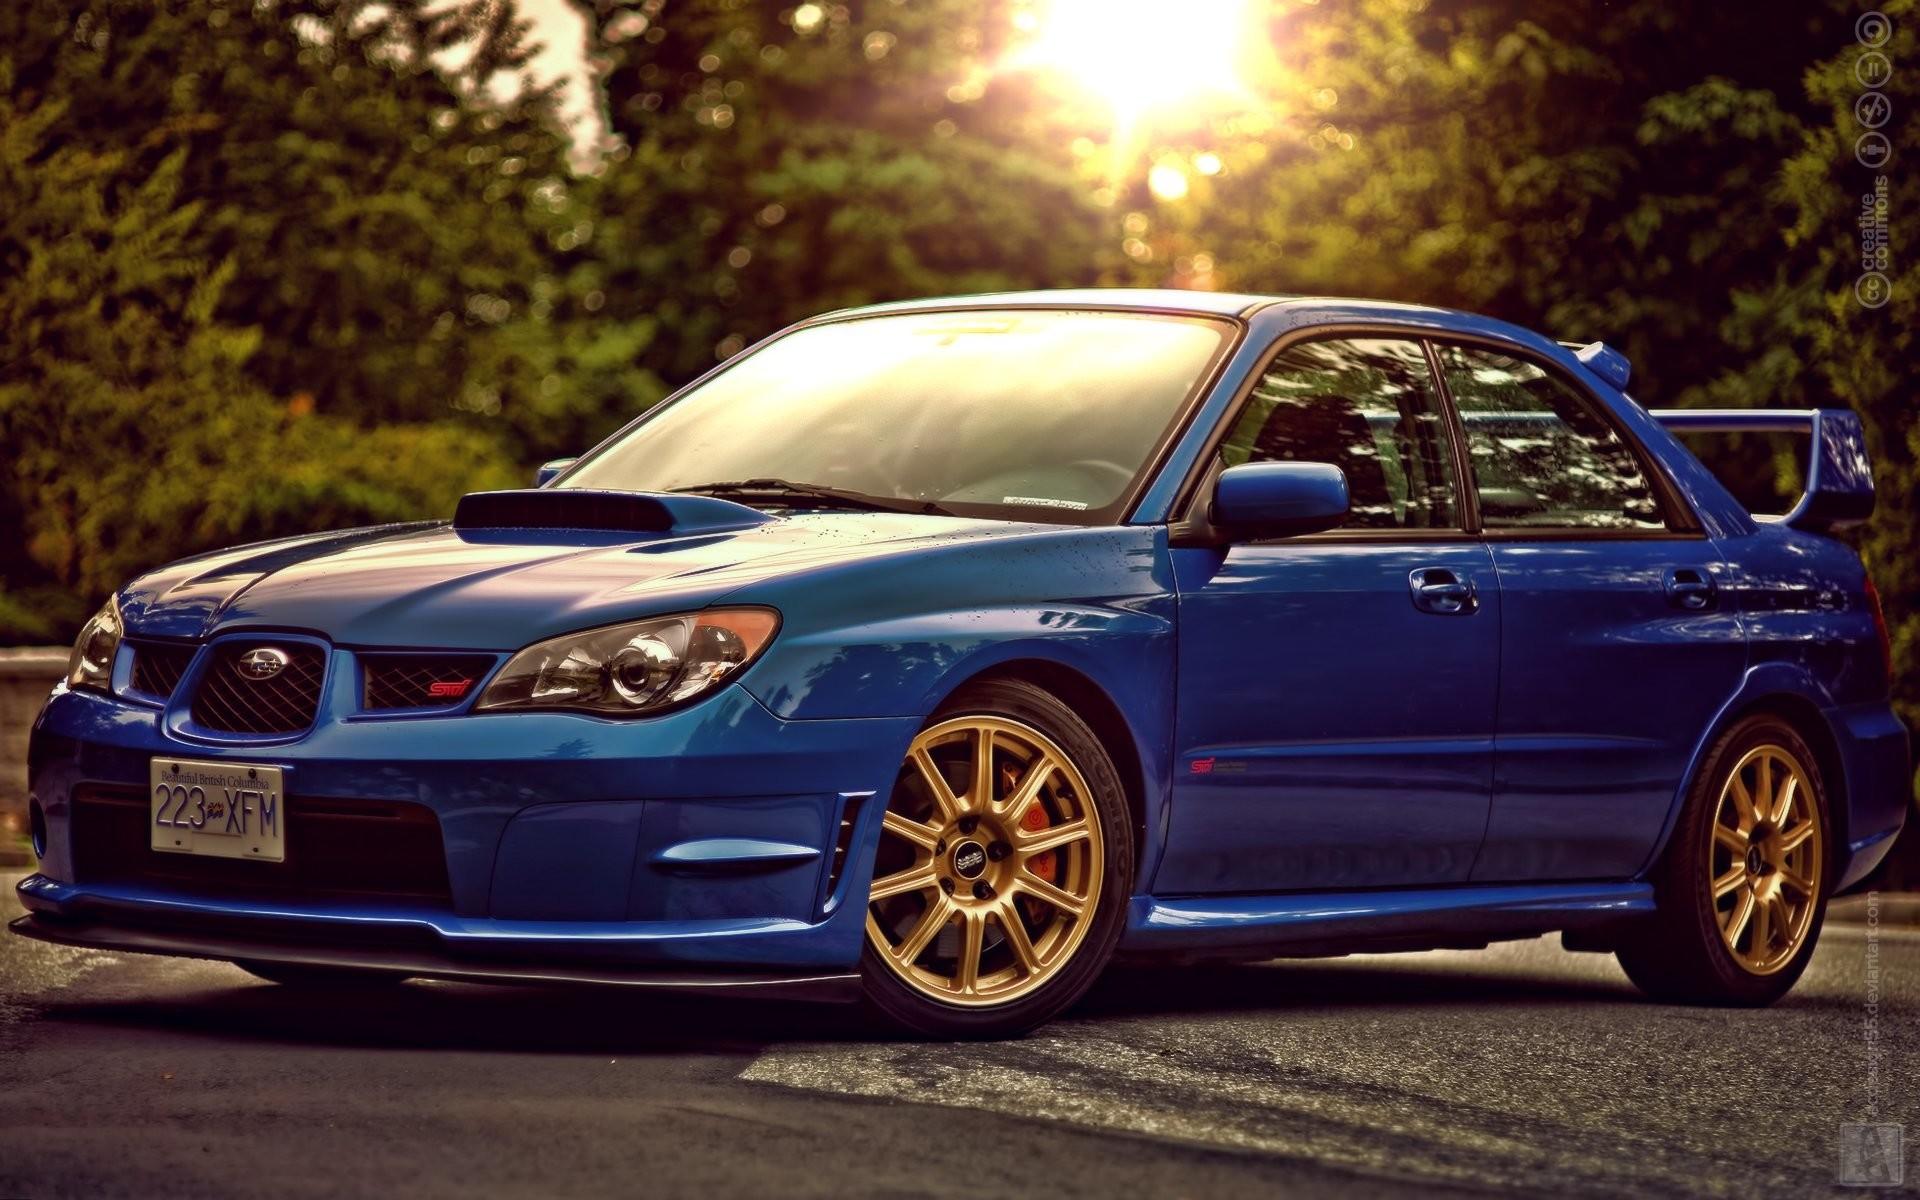 Subaru Impreza Wrx Sti Wallpaper 72 Images